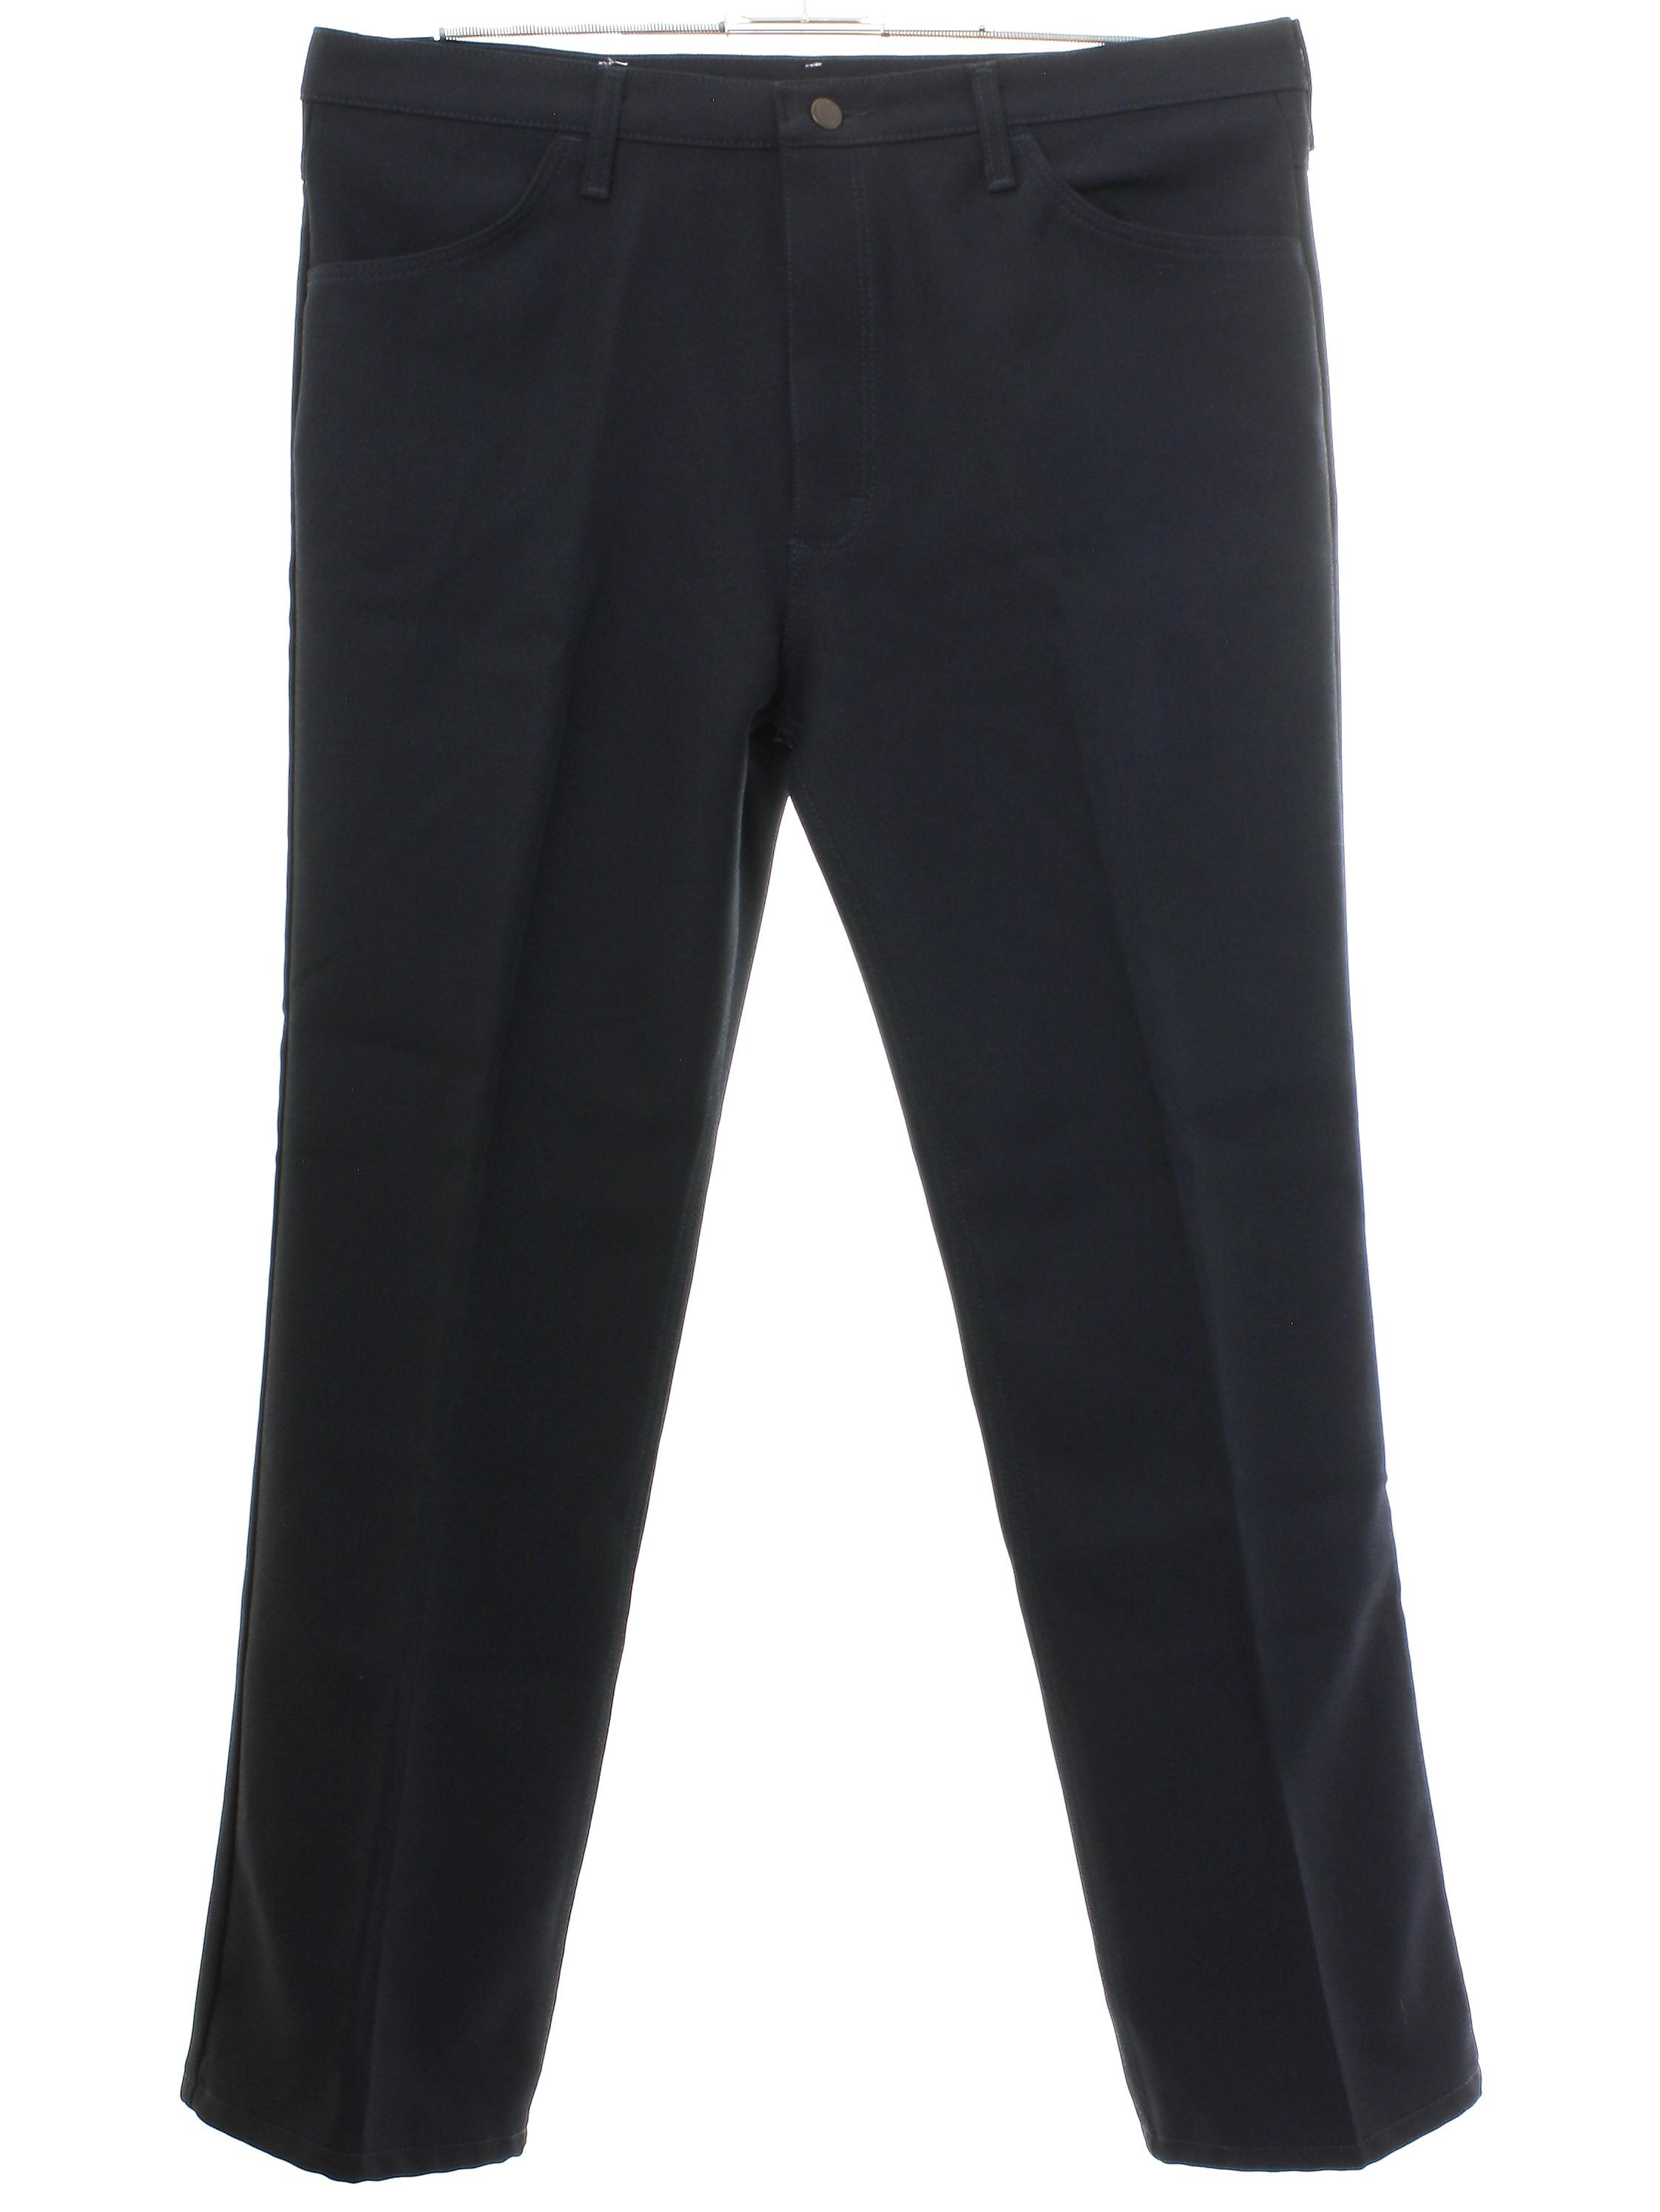 121fe12a Retro 70s Pants (Wrangler) : Late 70s or Early 80s -Wrangler- Mens ...